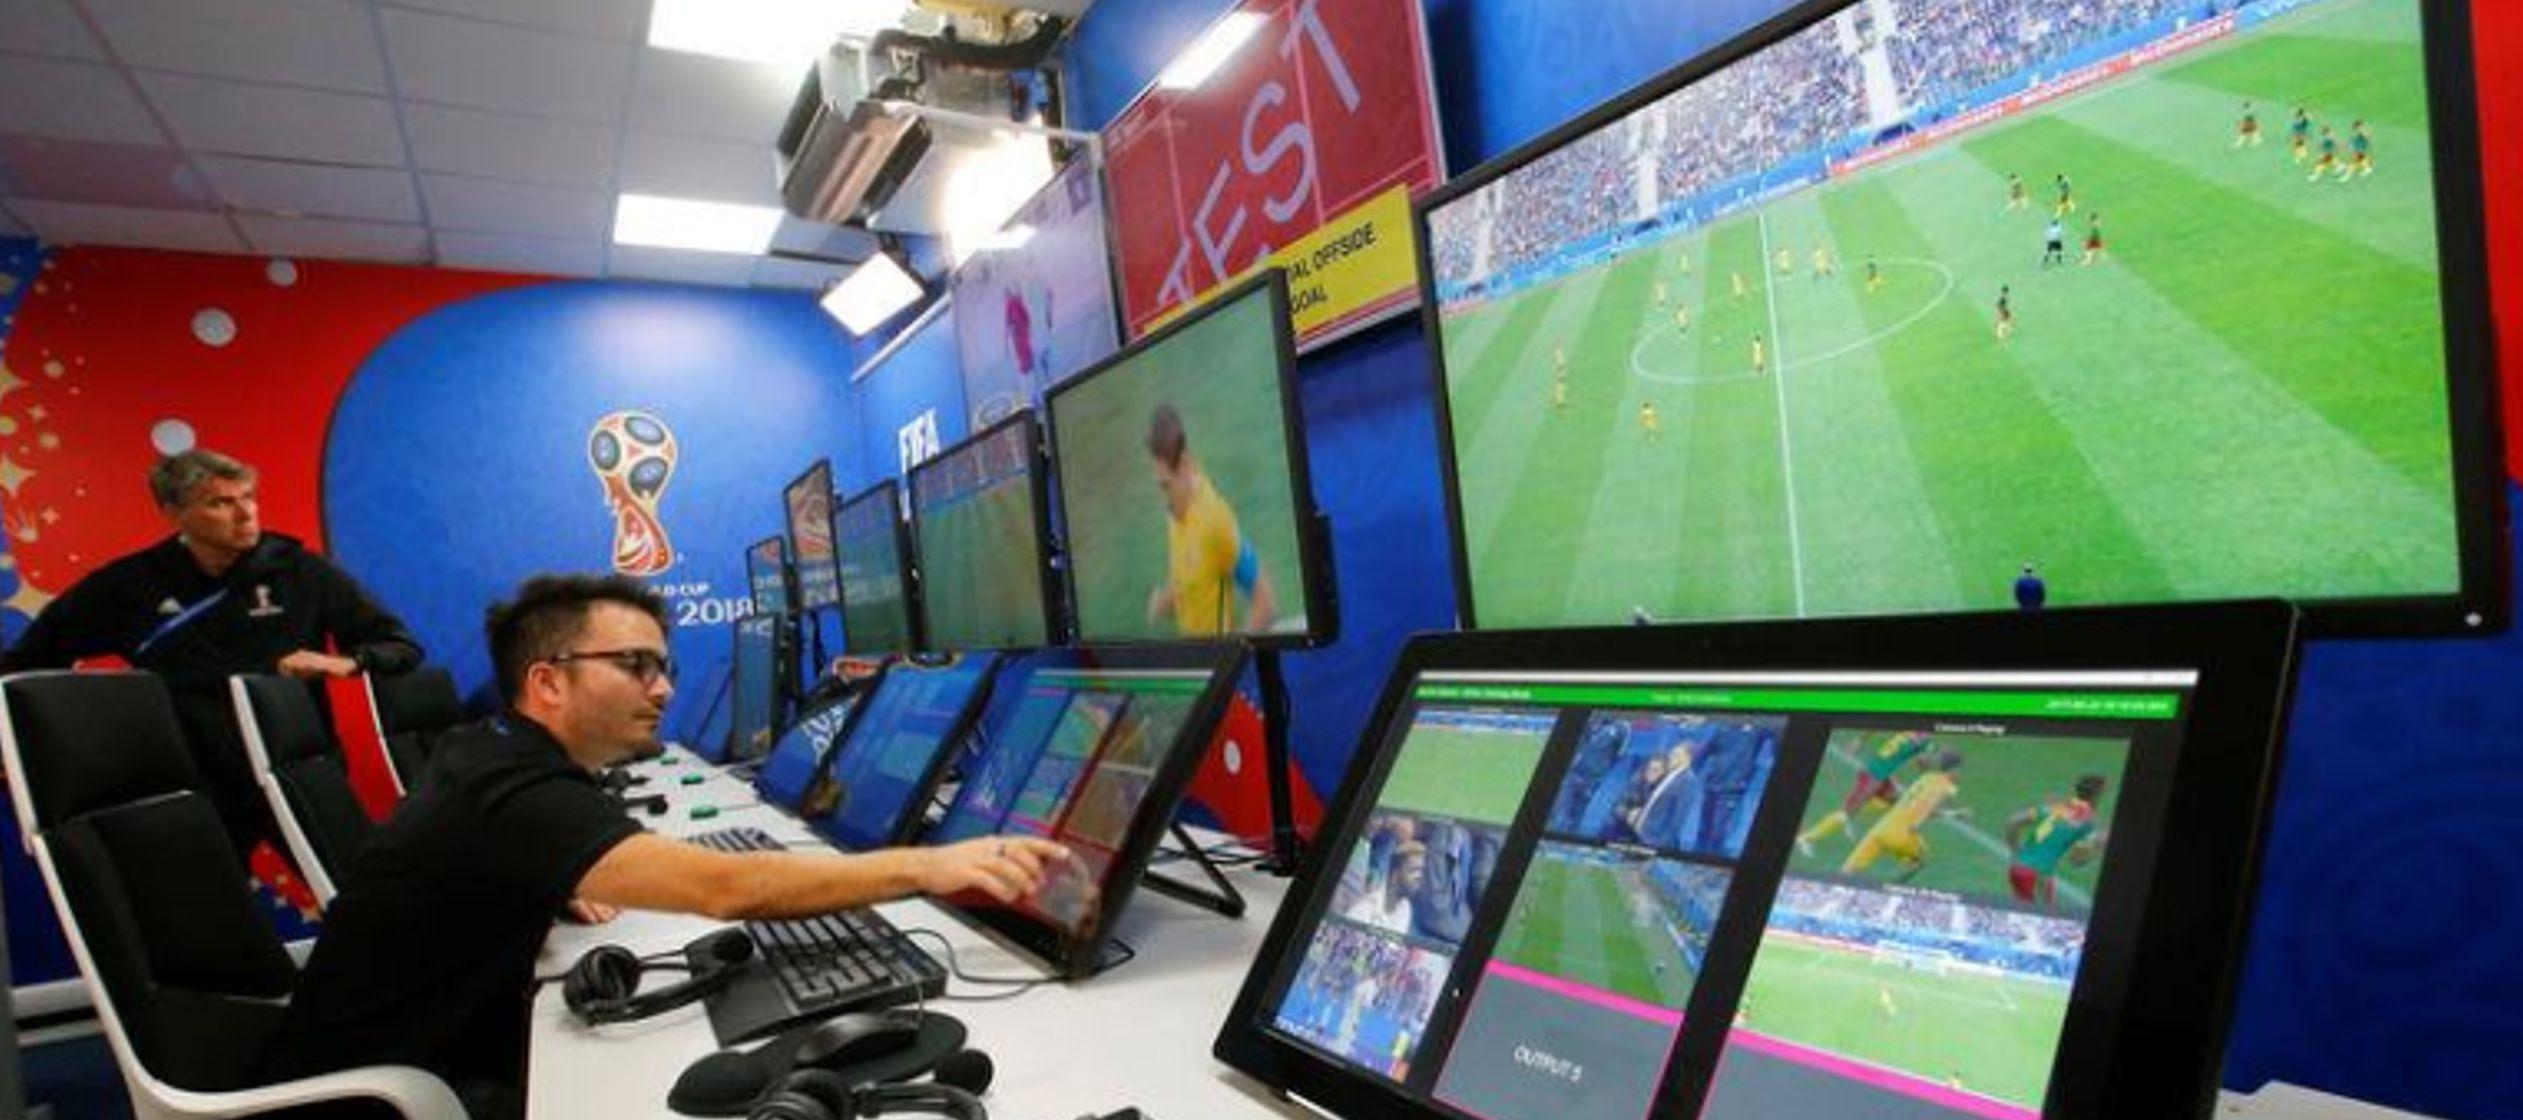 La decimotercera jornada del torneo Apertura se disputará entre el 19 y el 21 de octubre.